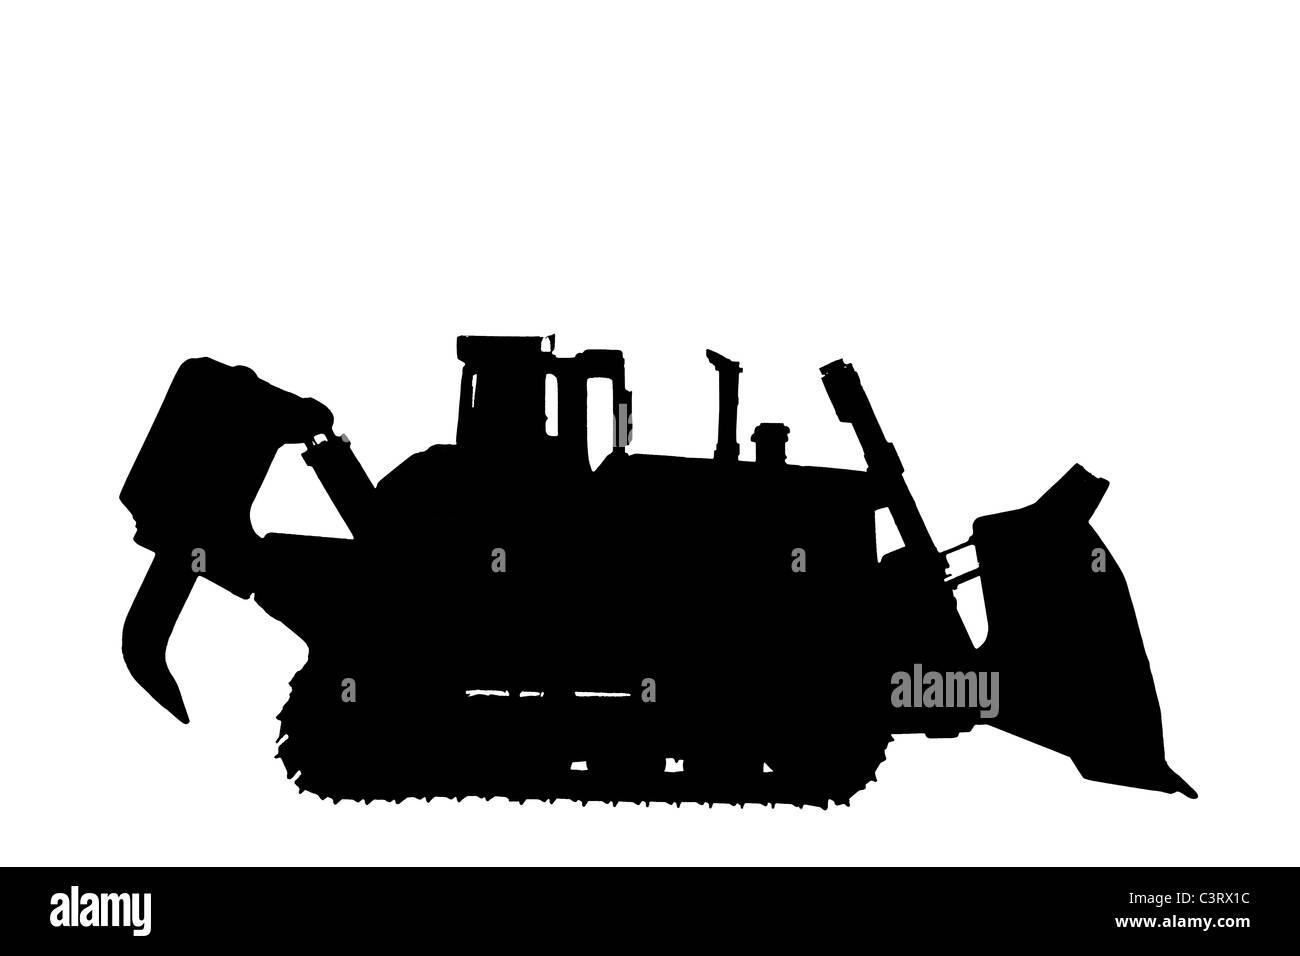 Silhouette of Caterpillar D11R bulldozer - Stock Image